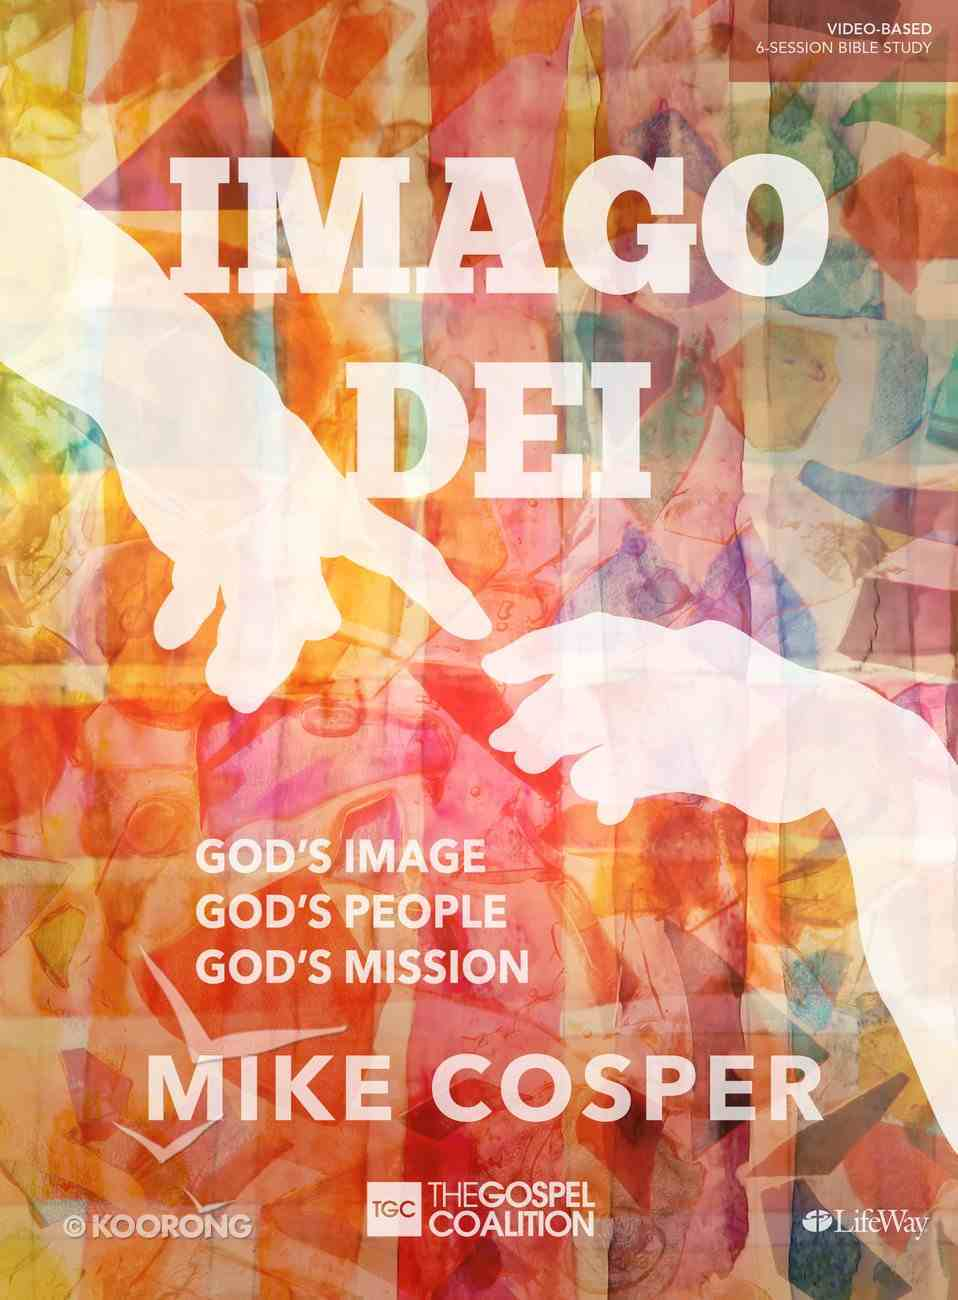 Imago Dei: God's Image, God's People, God's Mission (Bible Study Book) Paperback